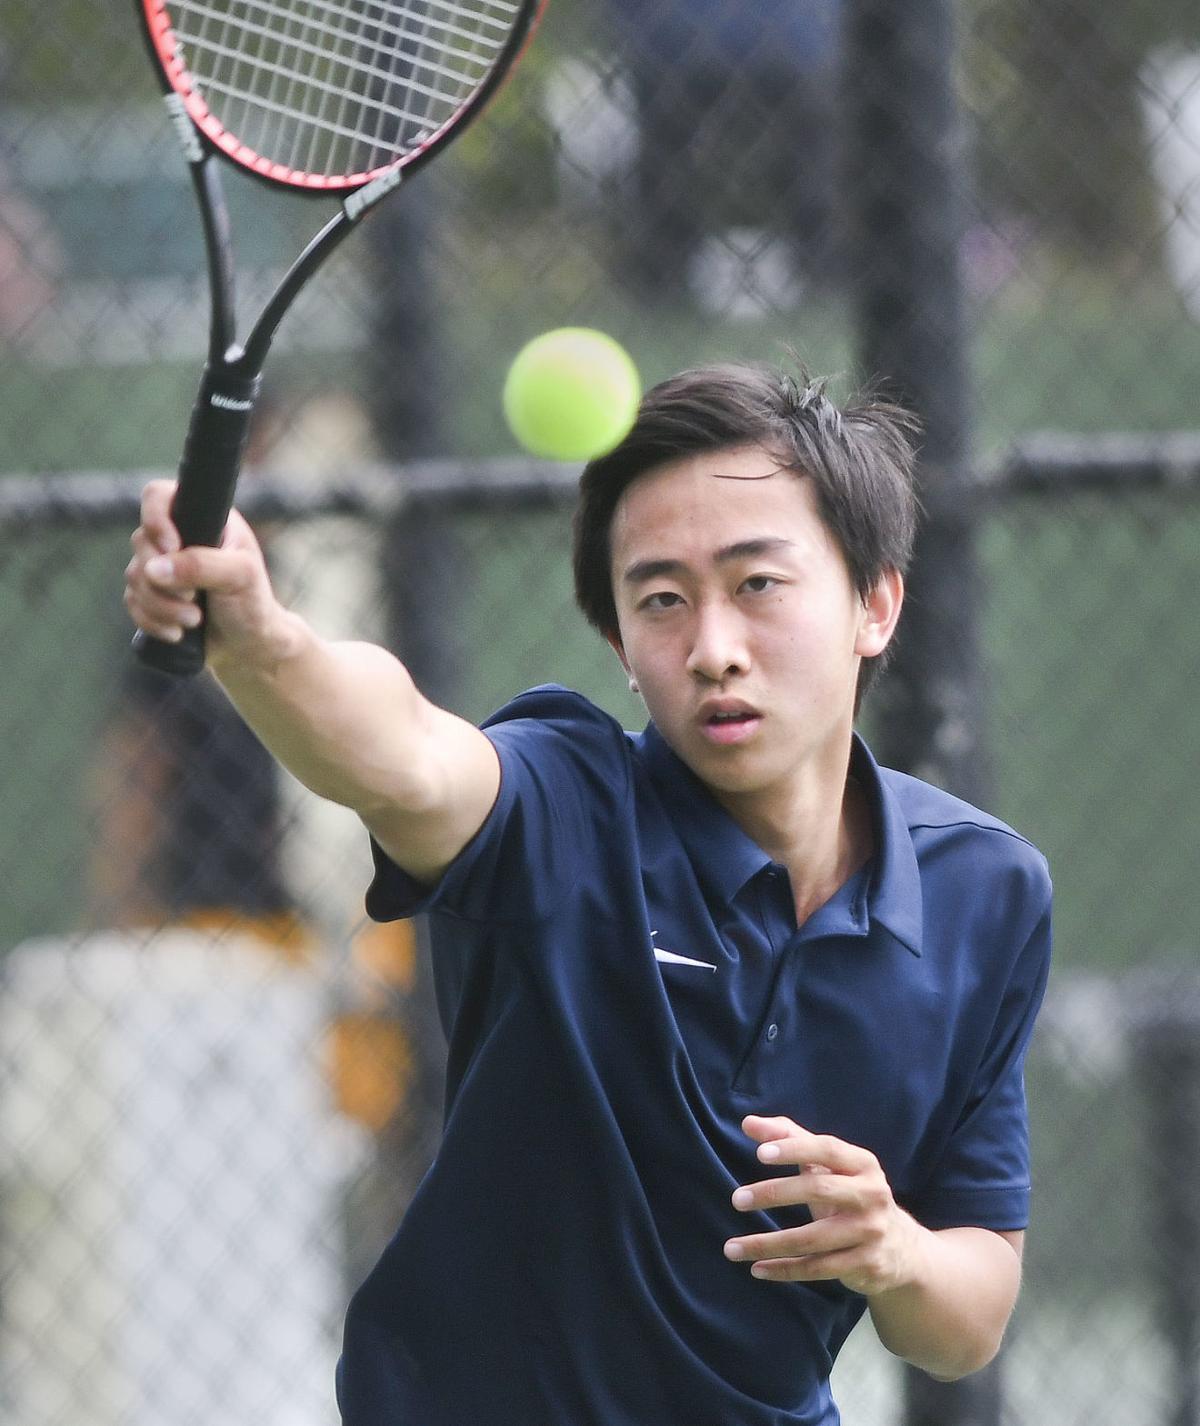 043019 Edison OA tennis 04.jpg